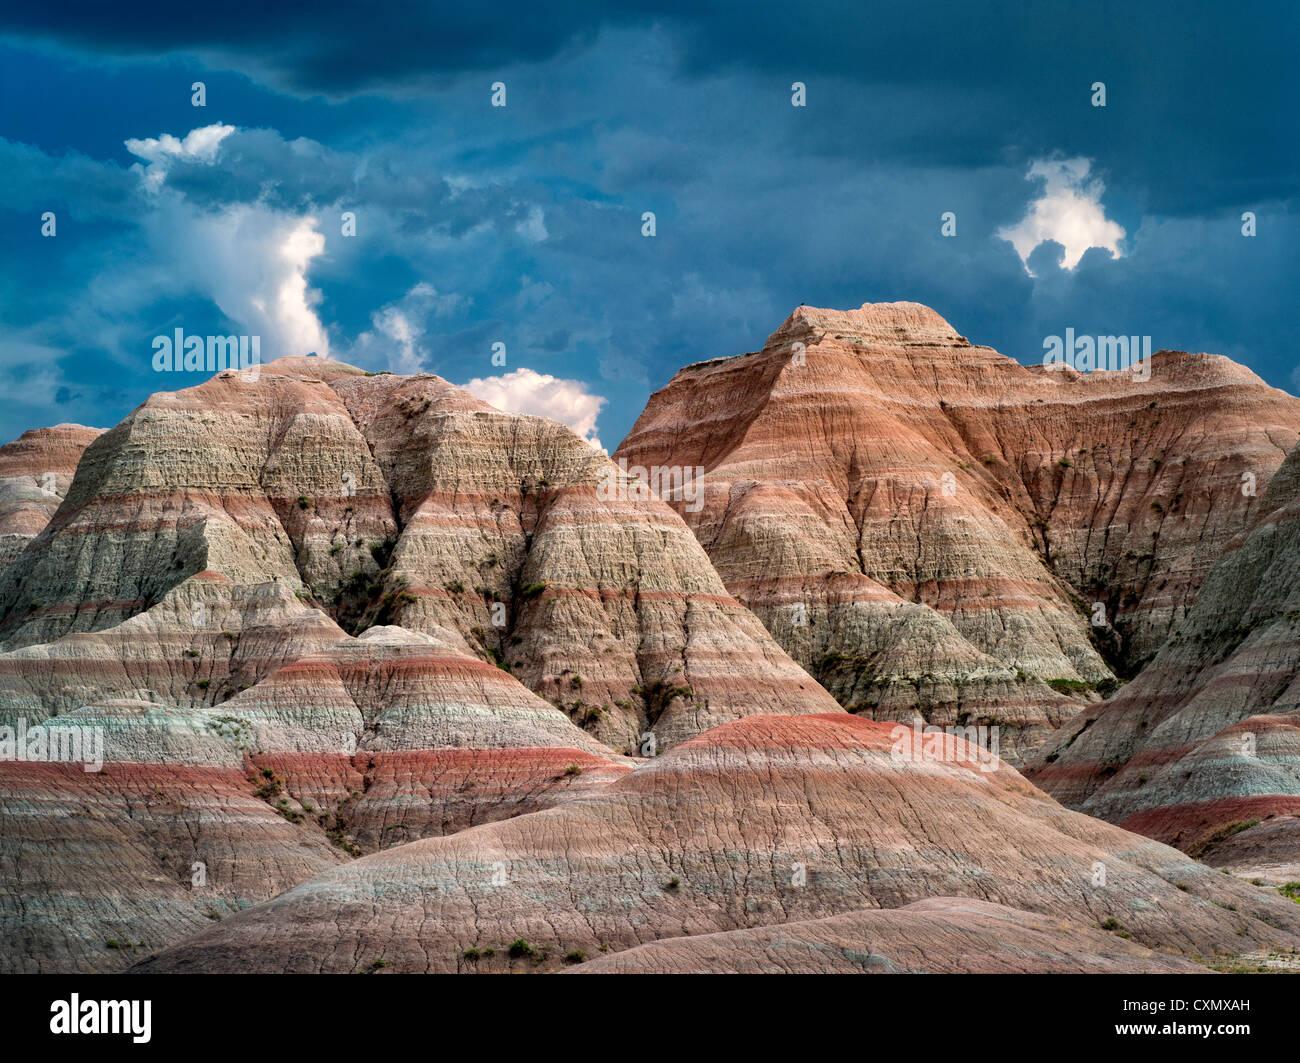 Colorful rocks at Badlands National Park, South Dakota - Stock Image